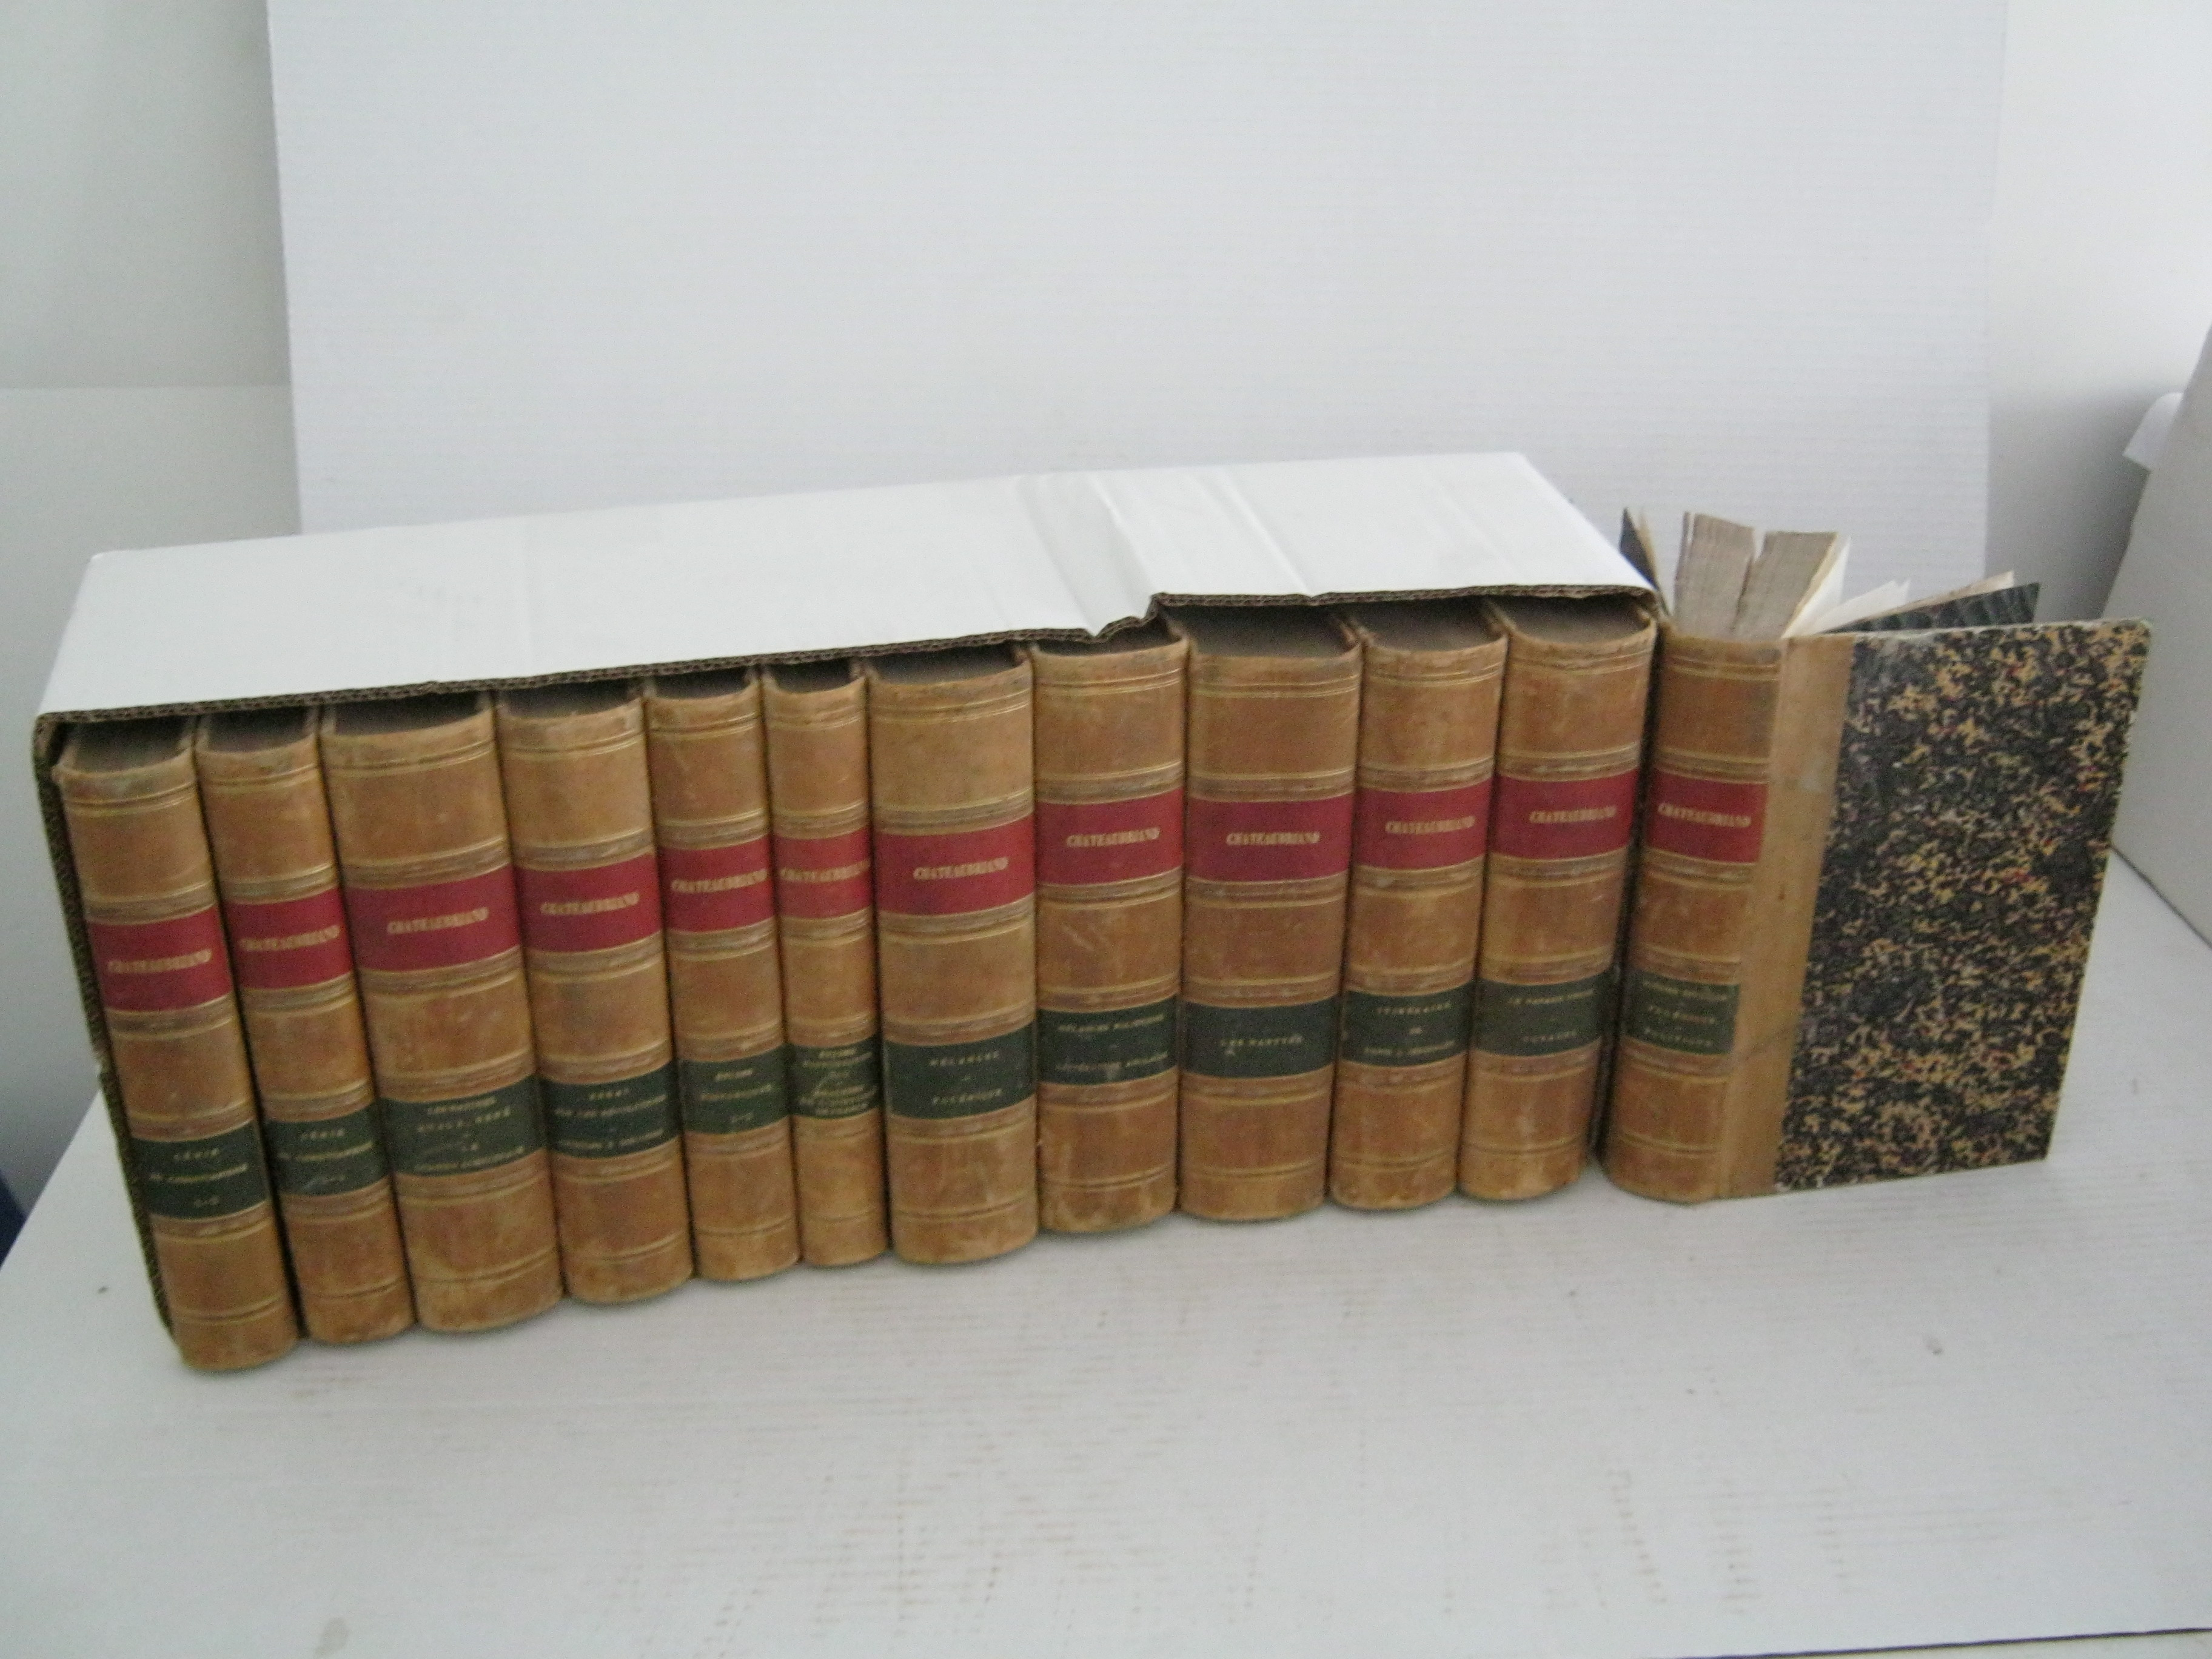 OEUVRES. 12 VOLUMES.